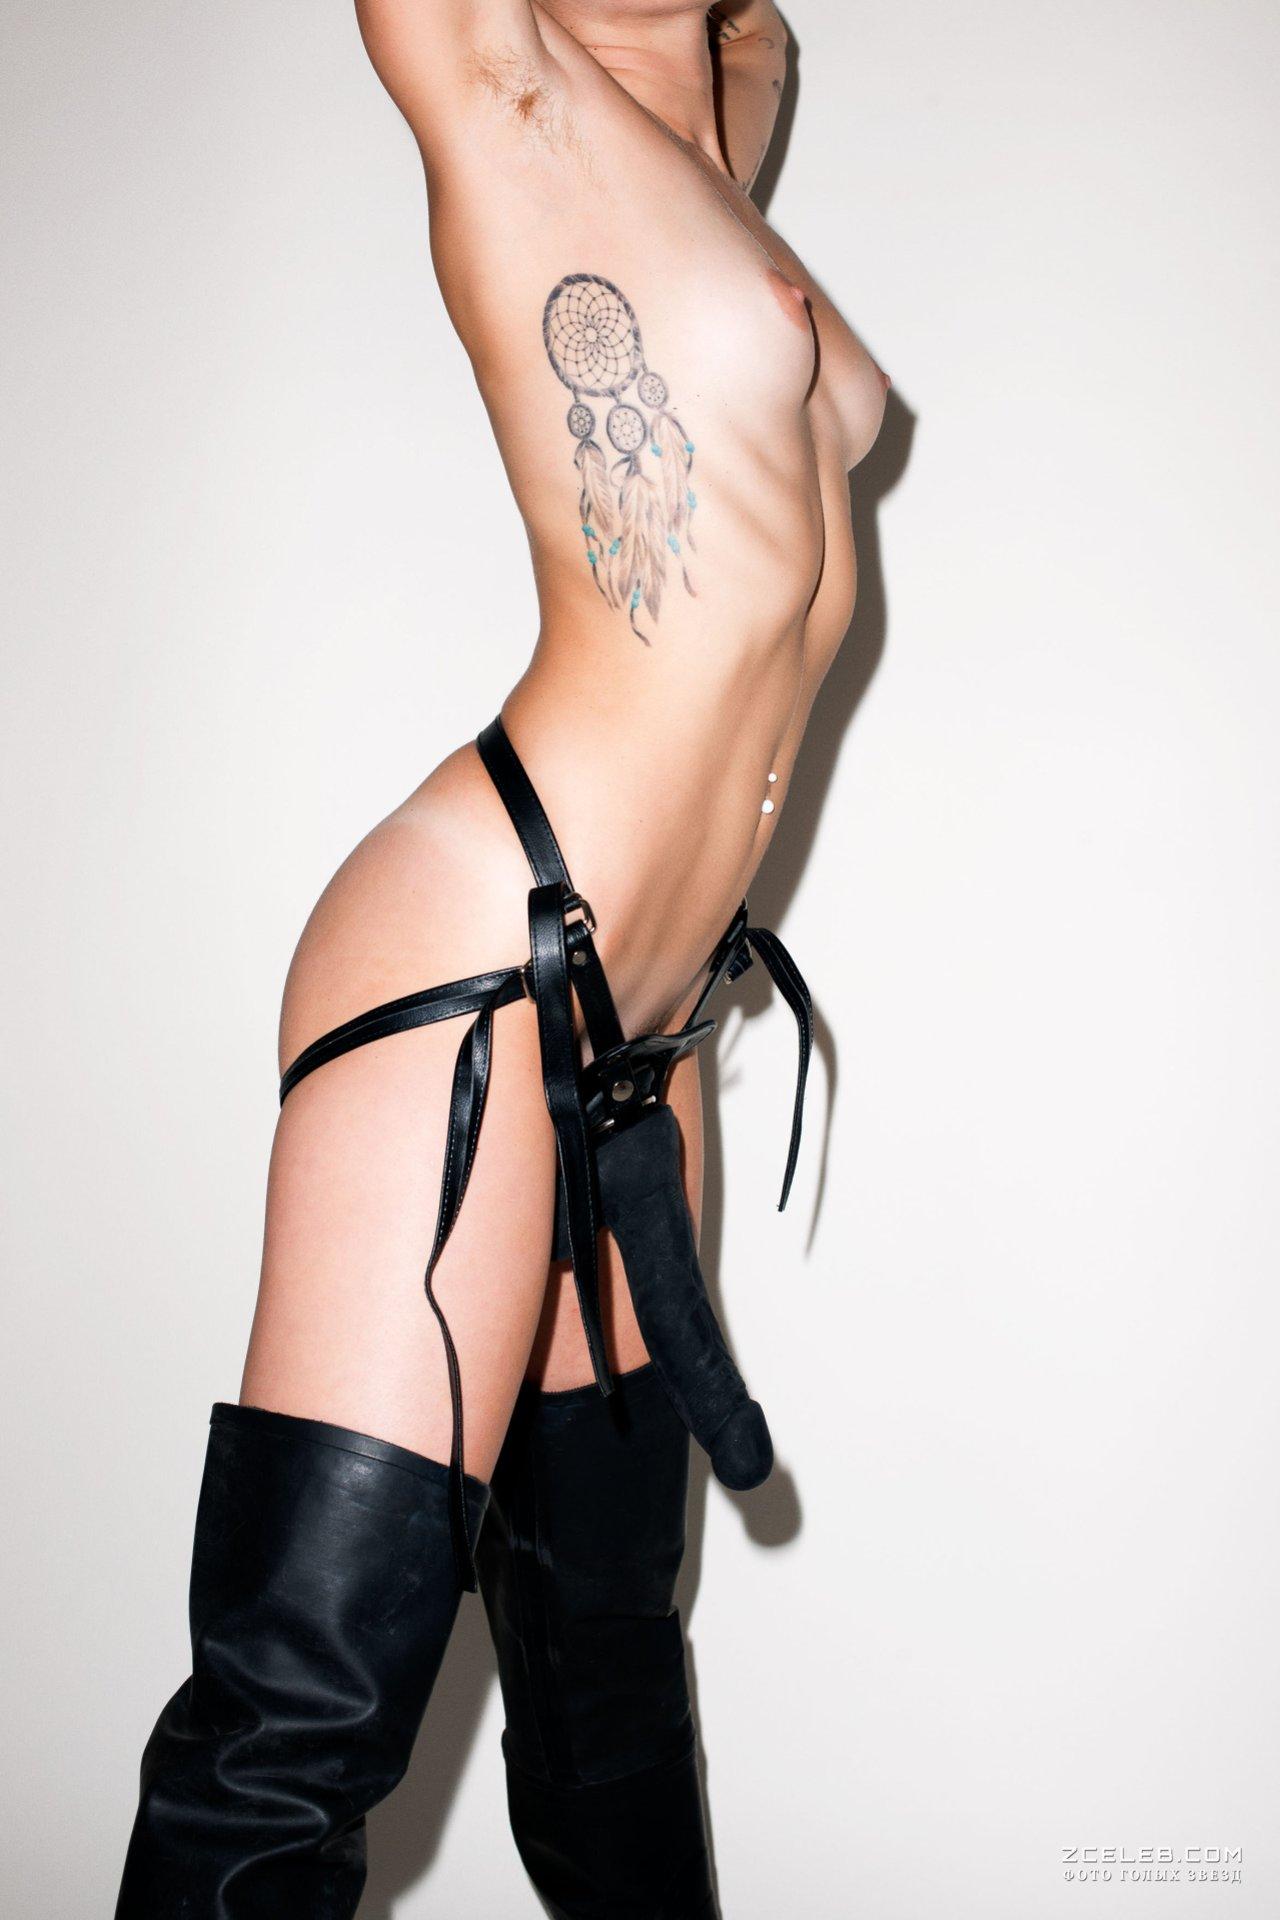 Miley Cyrus Boyfriend Cody Simpson Shares Sexy Photo